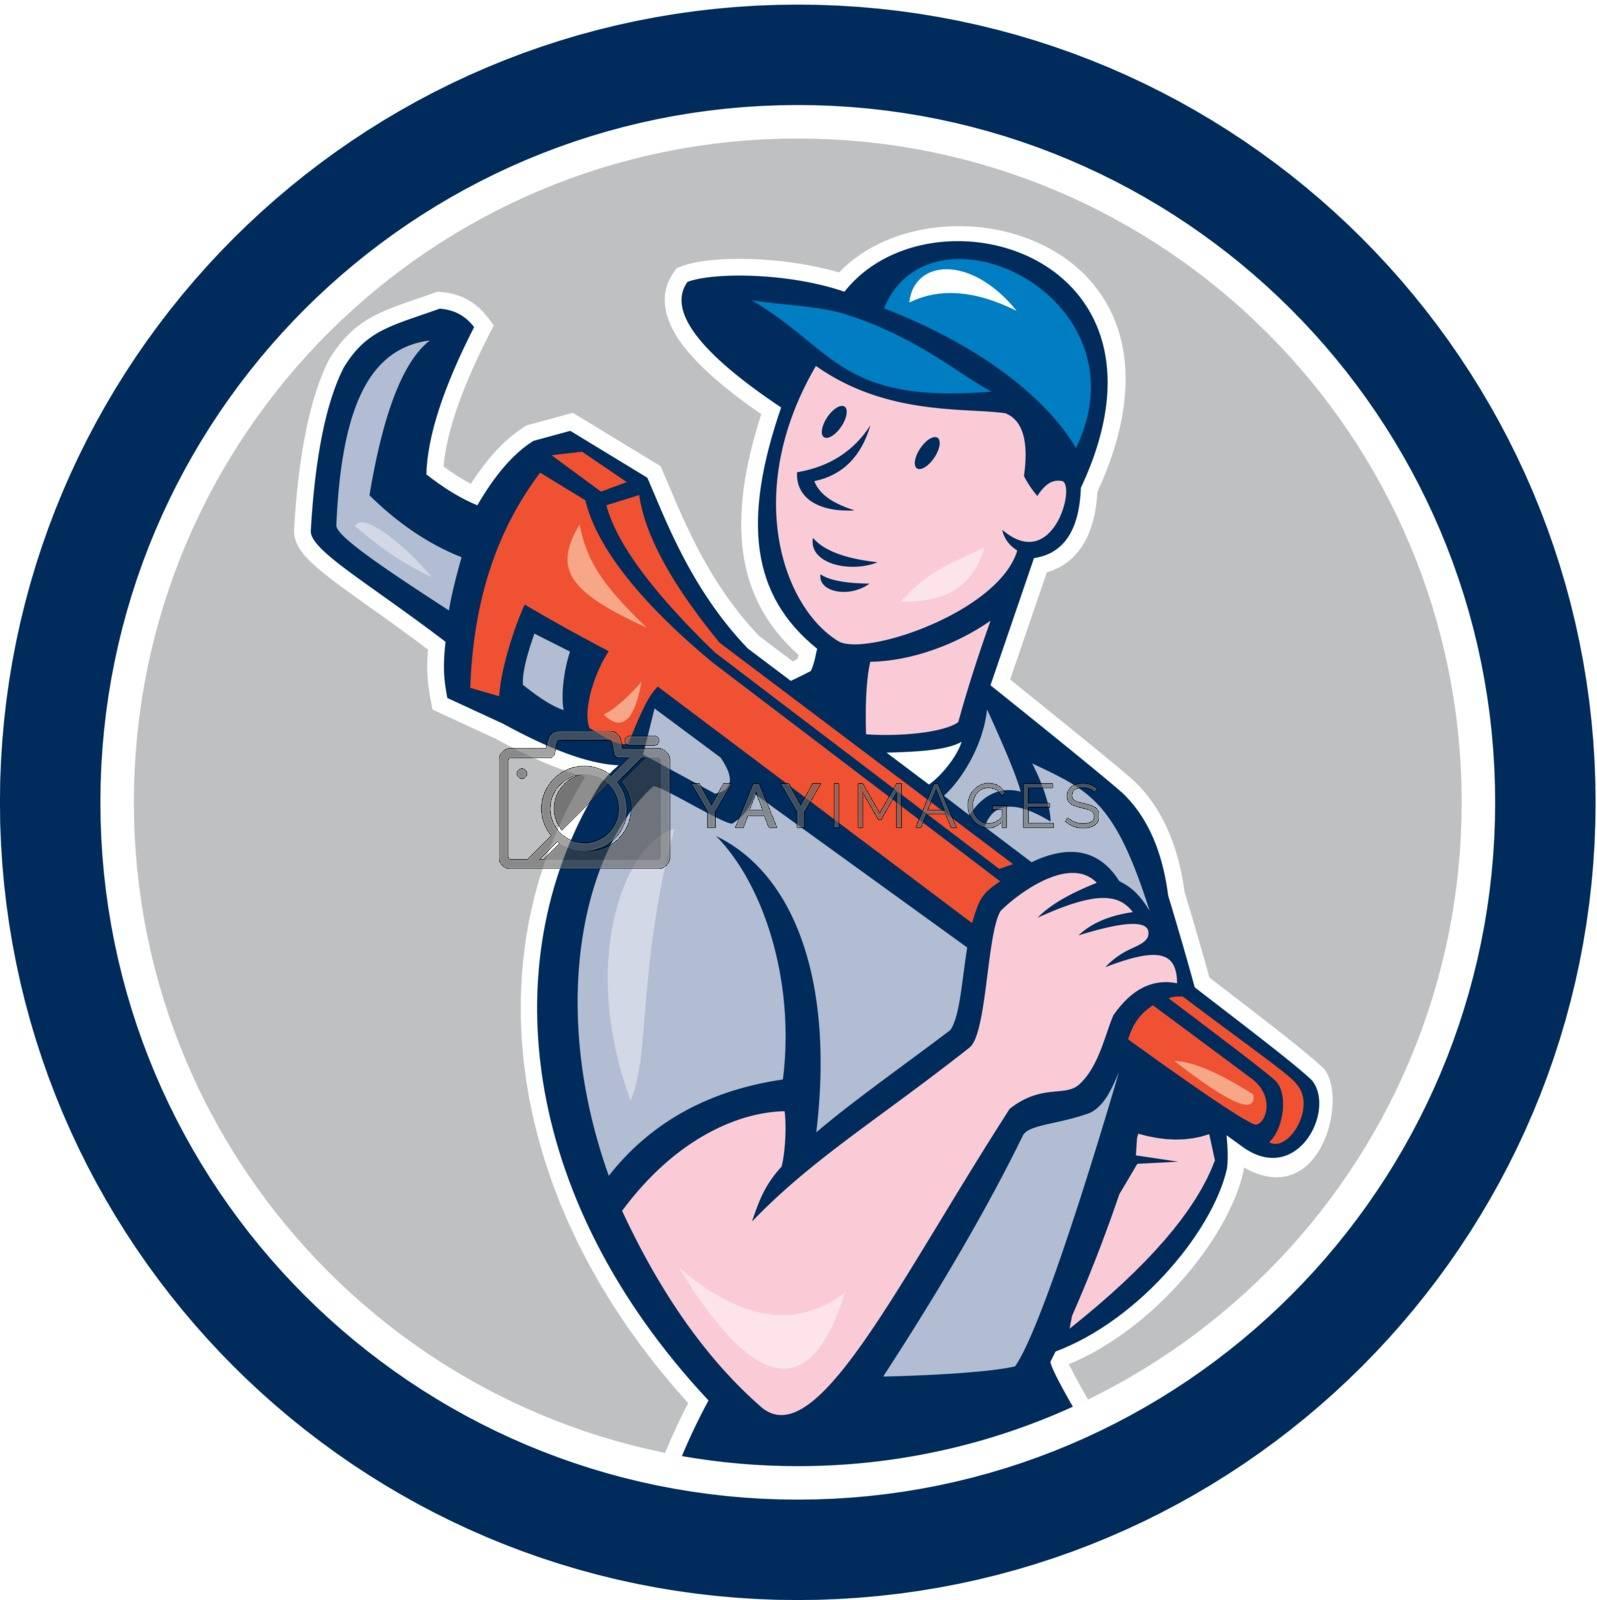 Royalty free image of Plumber Holding Monkey Wrench Circle Cartoon by patrimonio